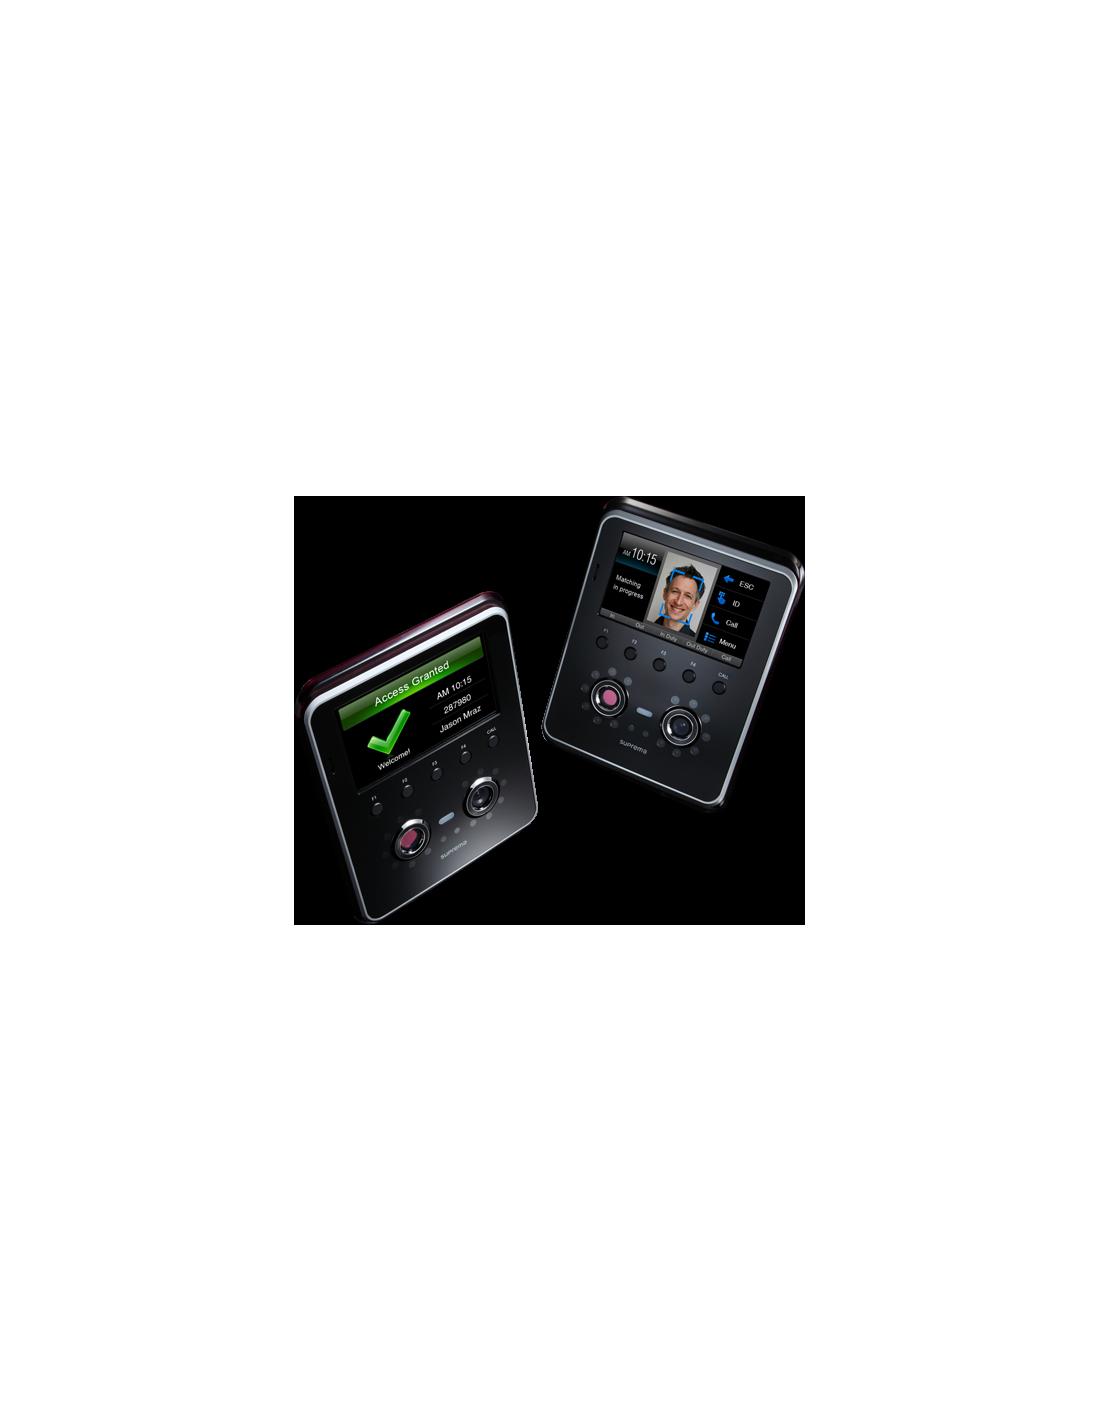 Control de acceso por Retina FaceStation - Tsimplifica